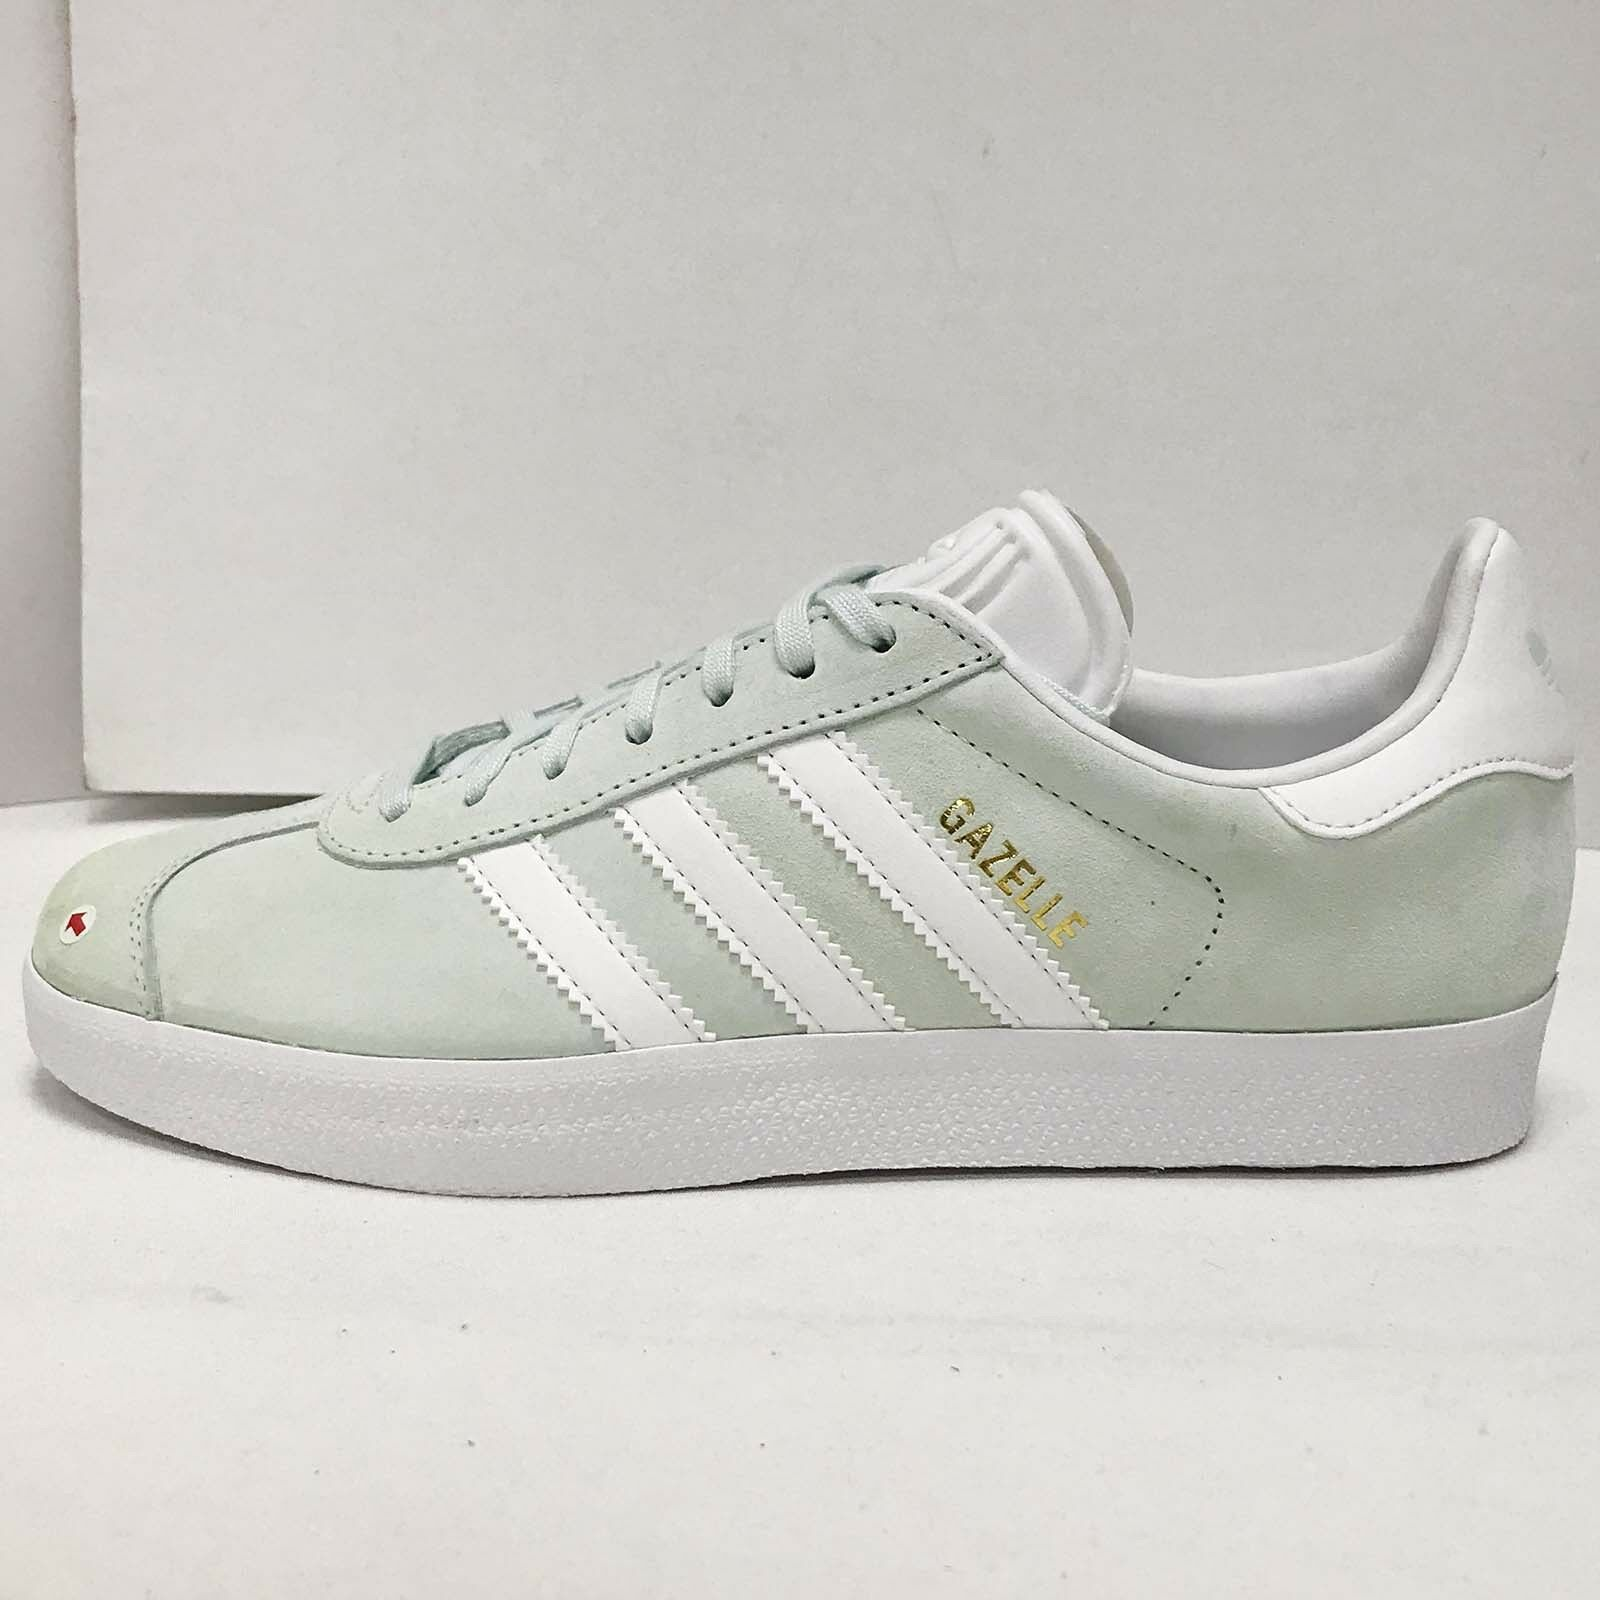 Adidas Originals Gazelle W Left Foot With Discoloration Women shoes BA9599